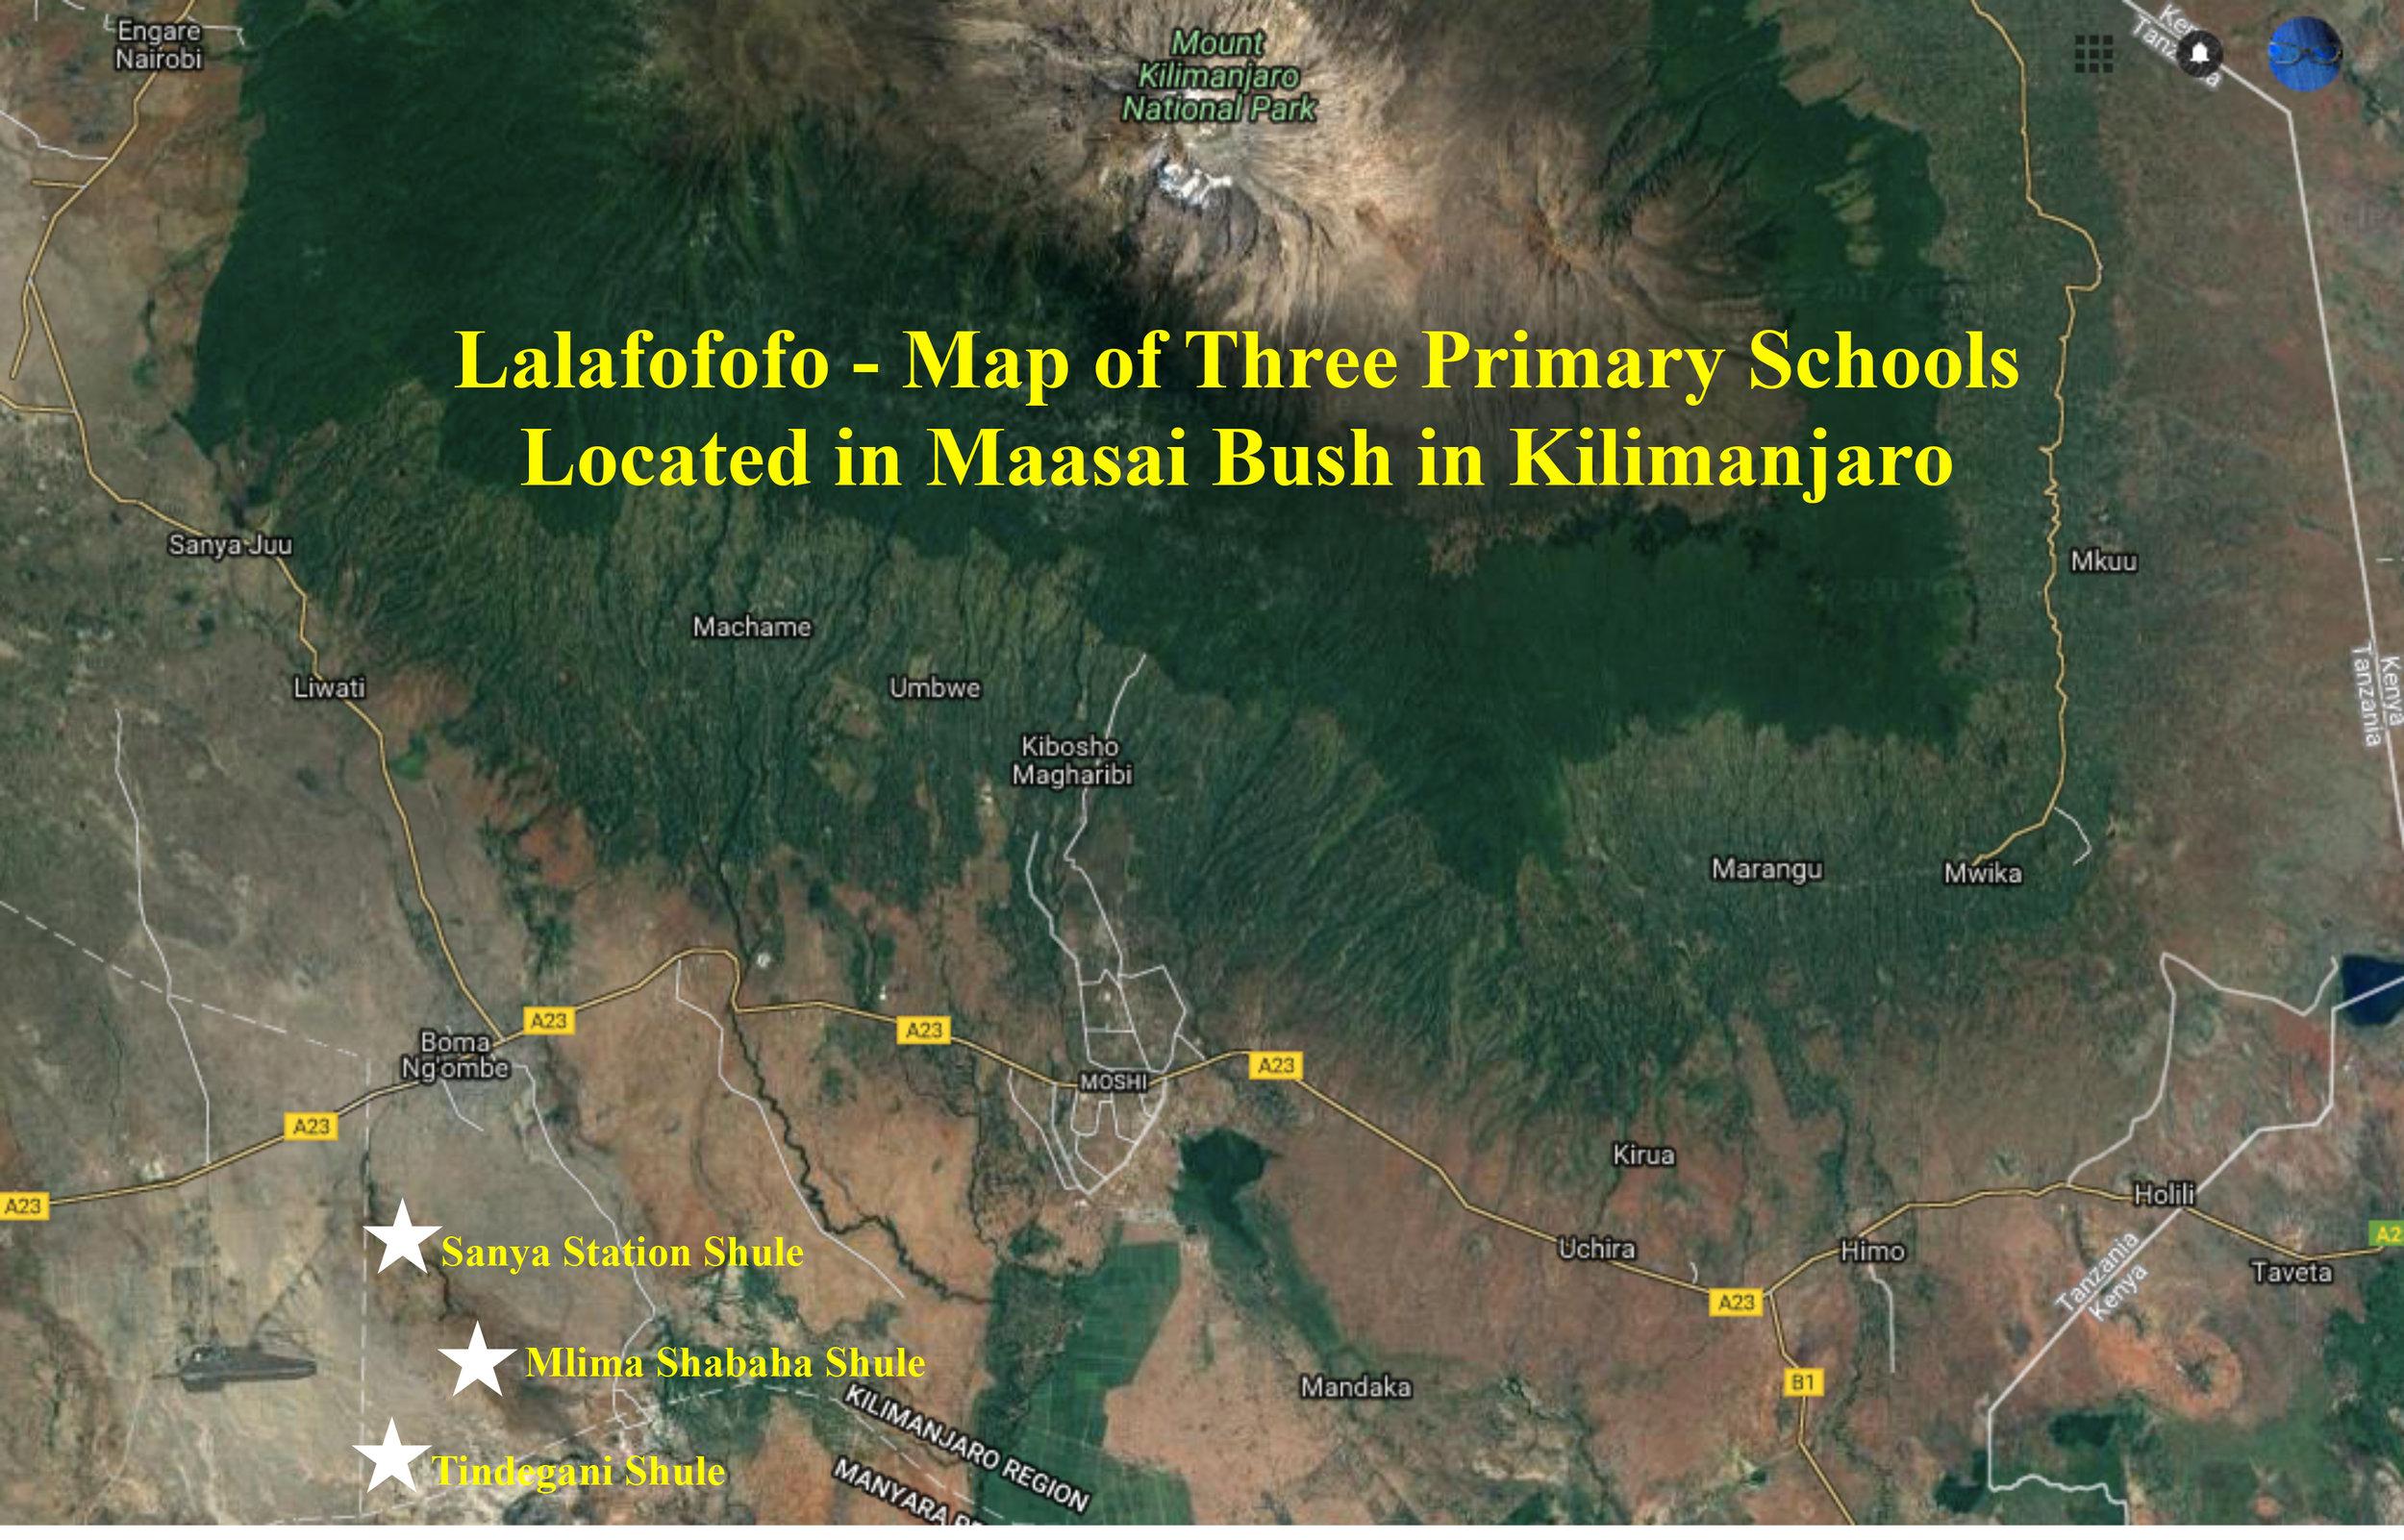 The three Lalafofofo school sites (bottom left) and their proximity to Mt. Kilimanjaro.